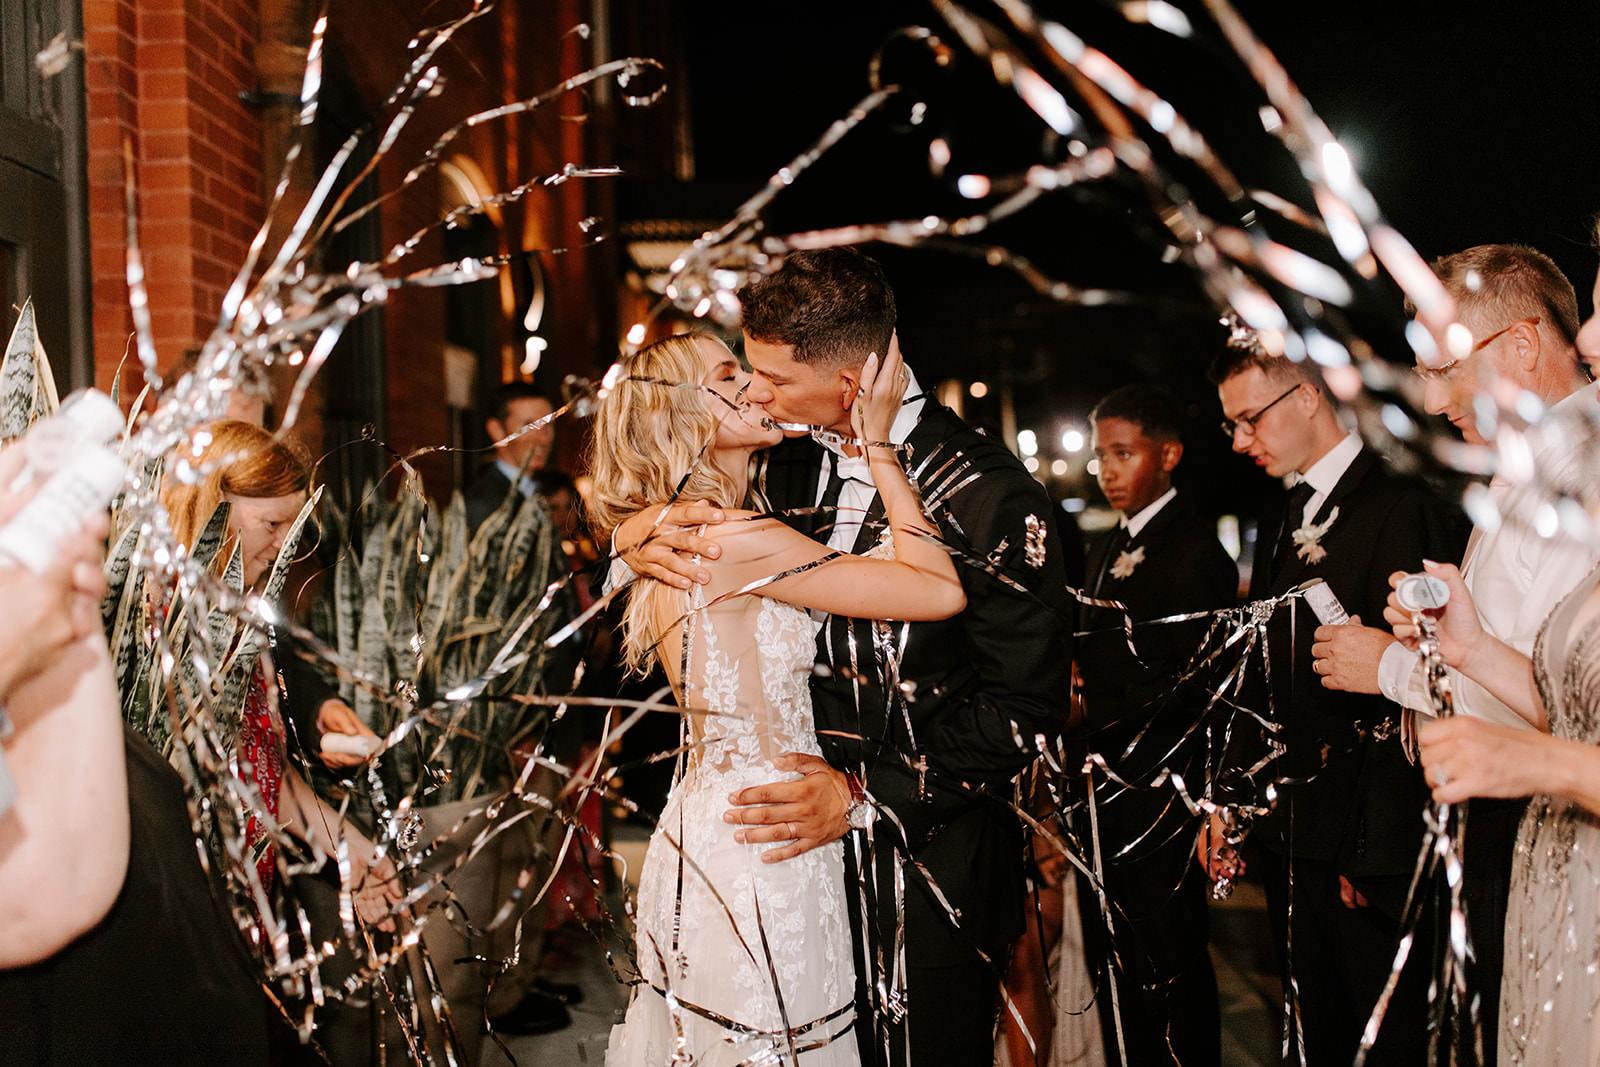 INSTAGRAM Boho Whimsical Creative Fun Bride and Groom Confetti Silver Tinsel Wedding Reception Exit Portrait